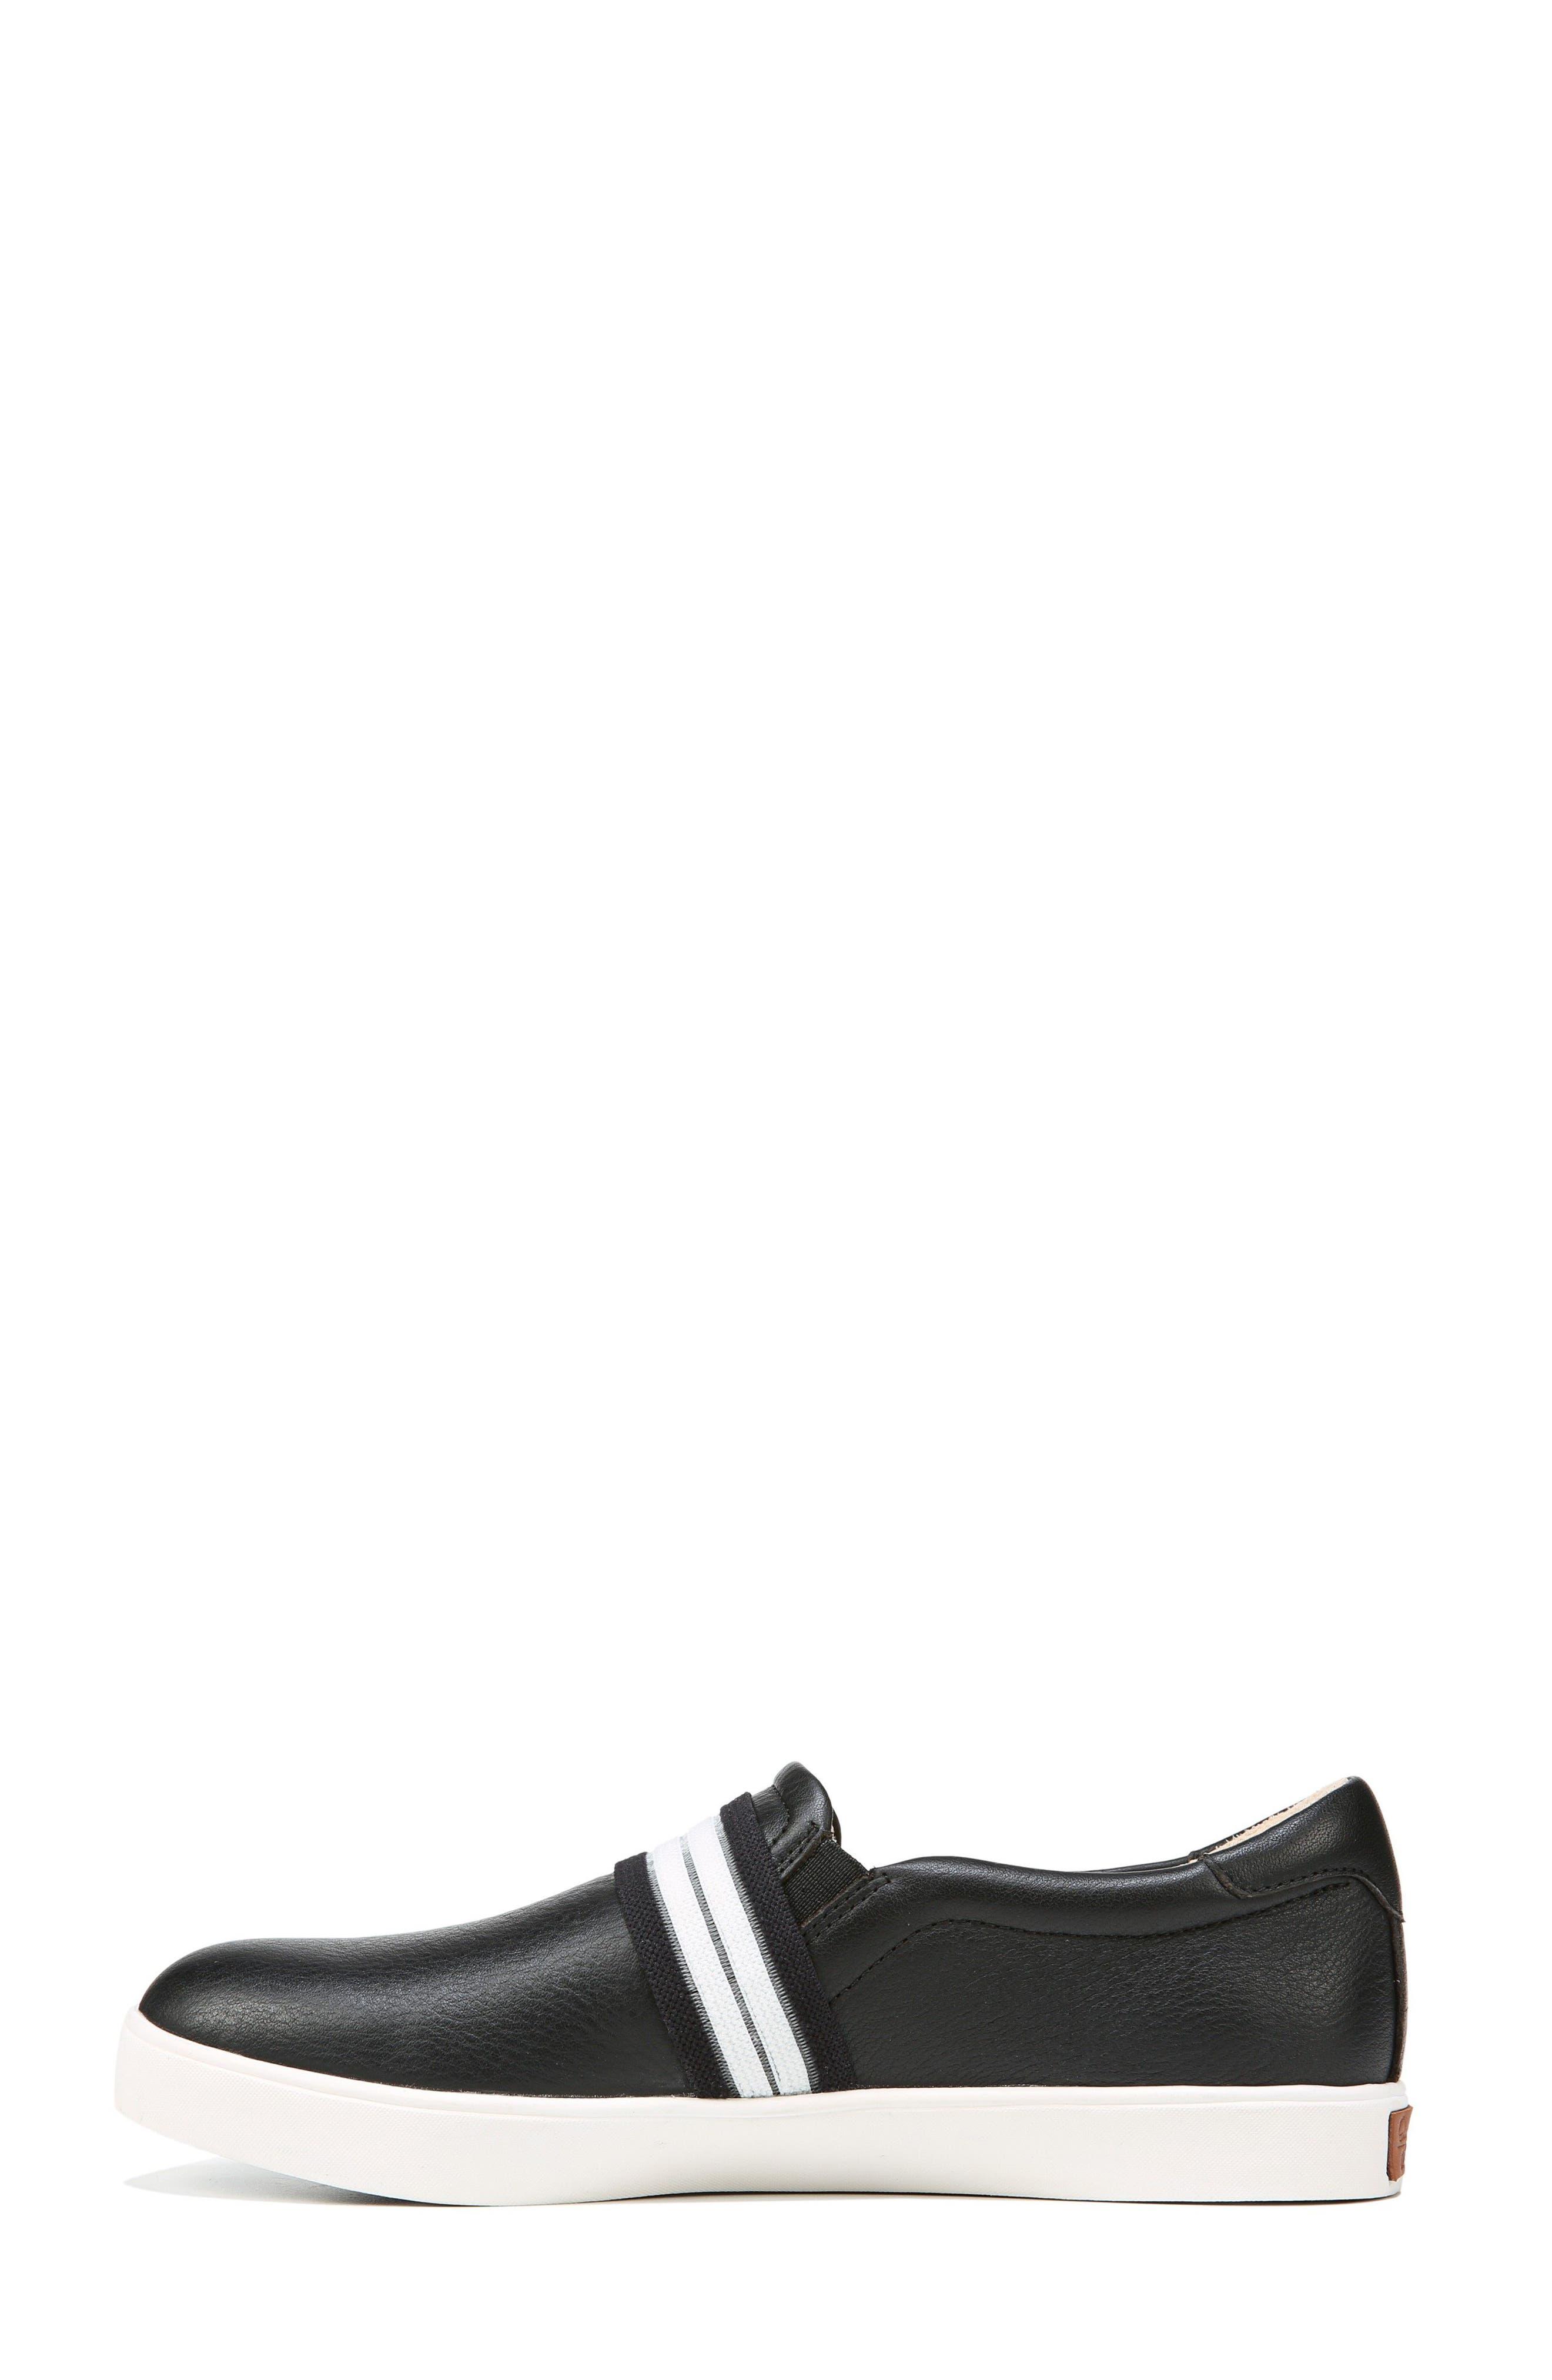 DR. SCHOLL'S, Scout Slip-On Sneaker, Alternate thumbnail 3, color, BLACK LEATHER 2